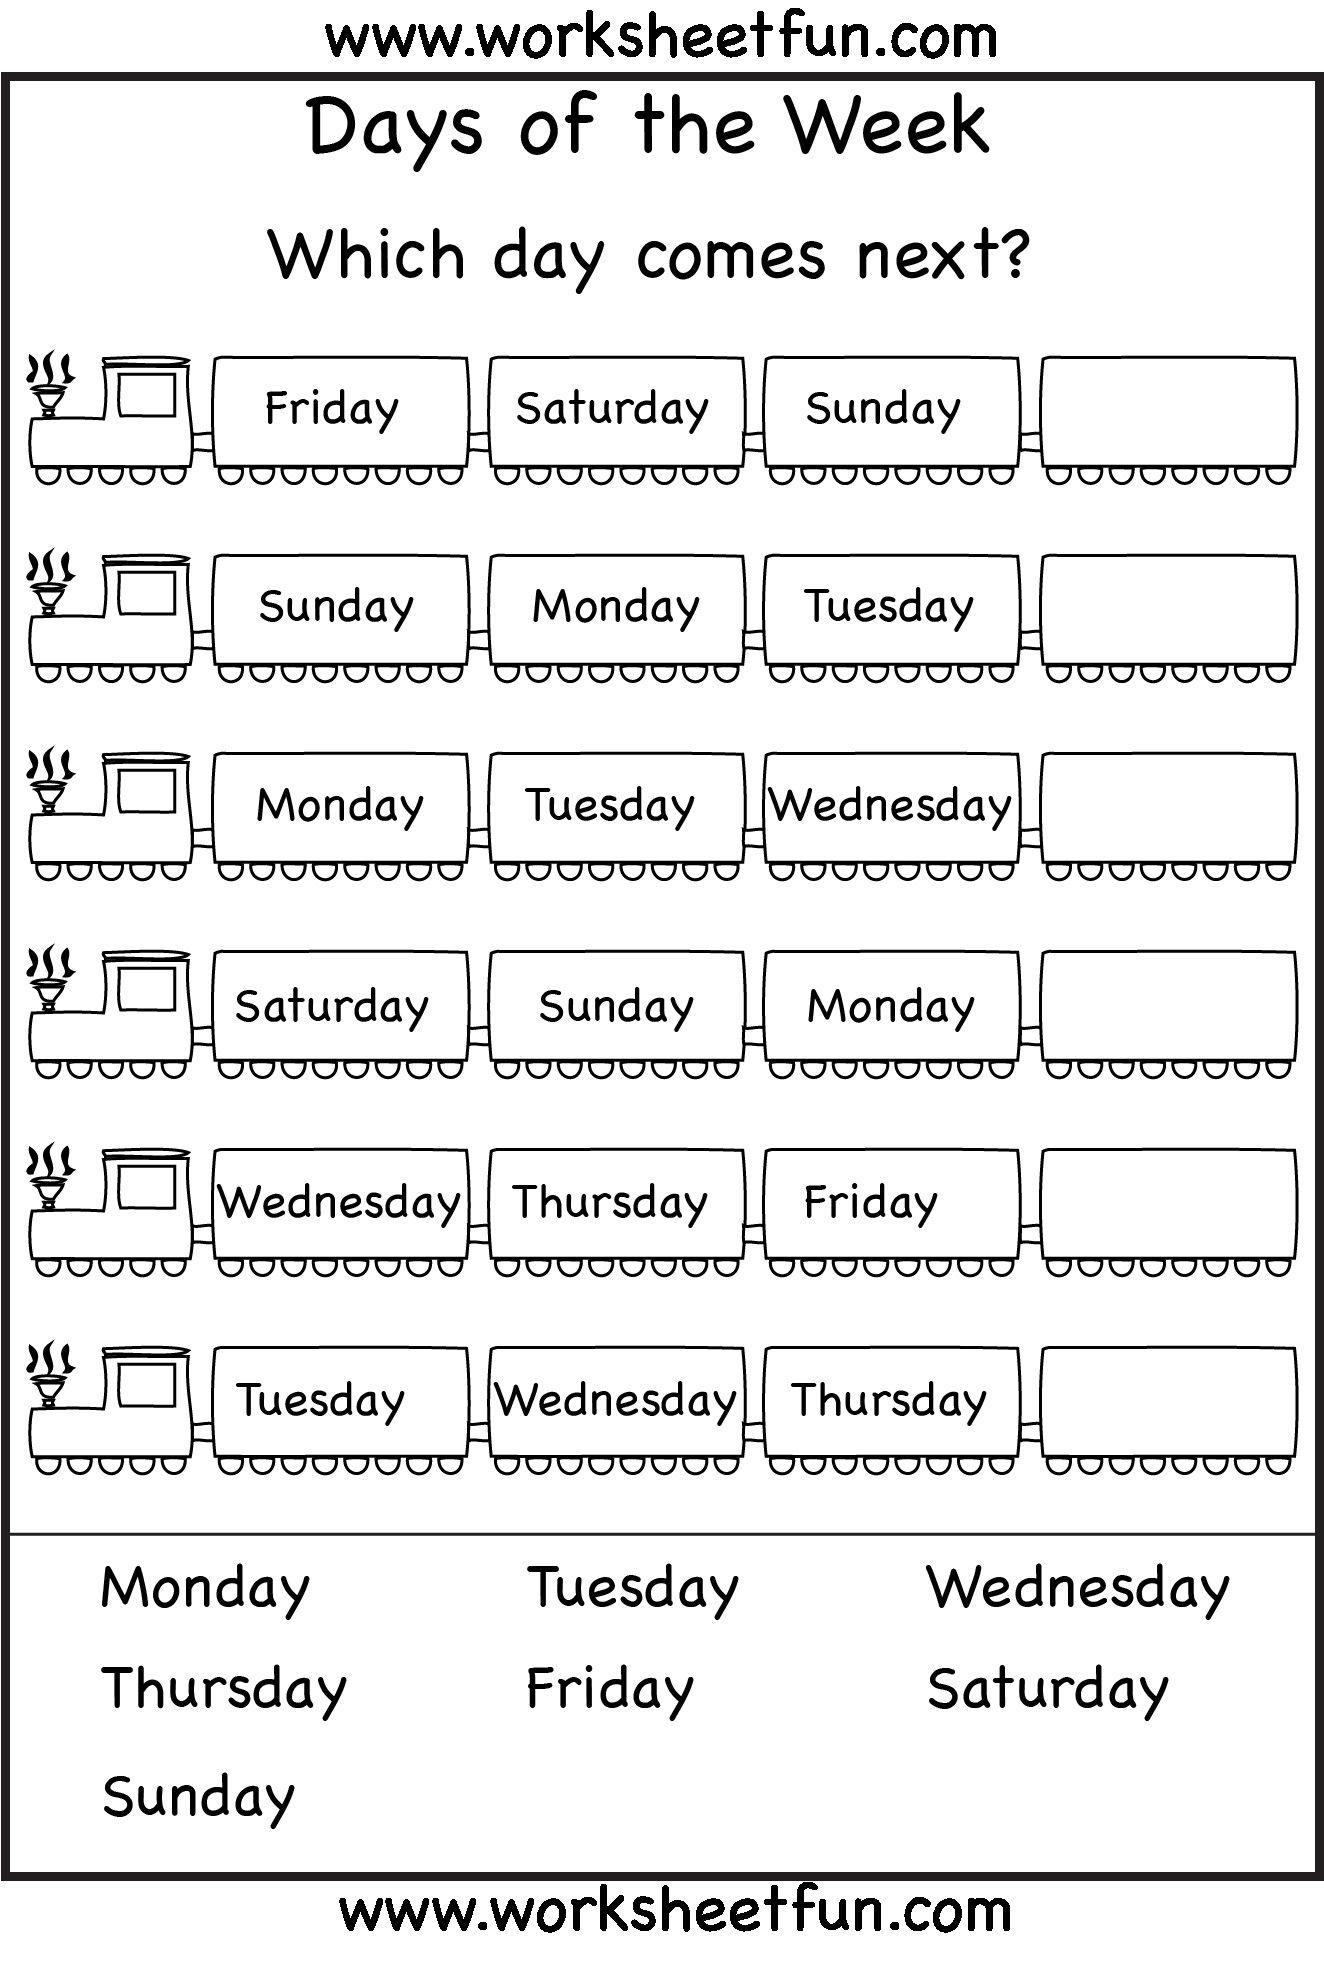 2 Worksheets Activities My First Sentences Gs Pin Von Sarah F Auf Grundschule Engl English Worksheets For Kids 2nd Grade Math Worksheets First Grade Worksheets [ 1964 x 1324 Pixel ]